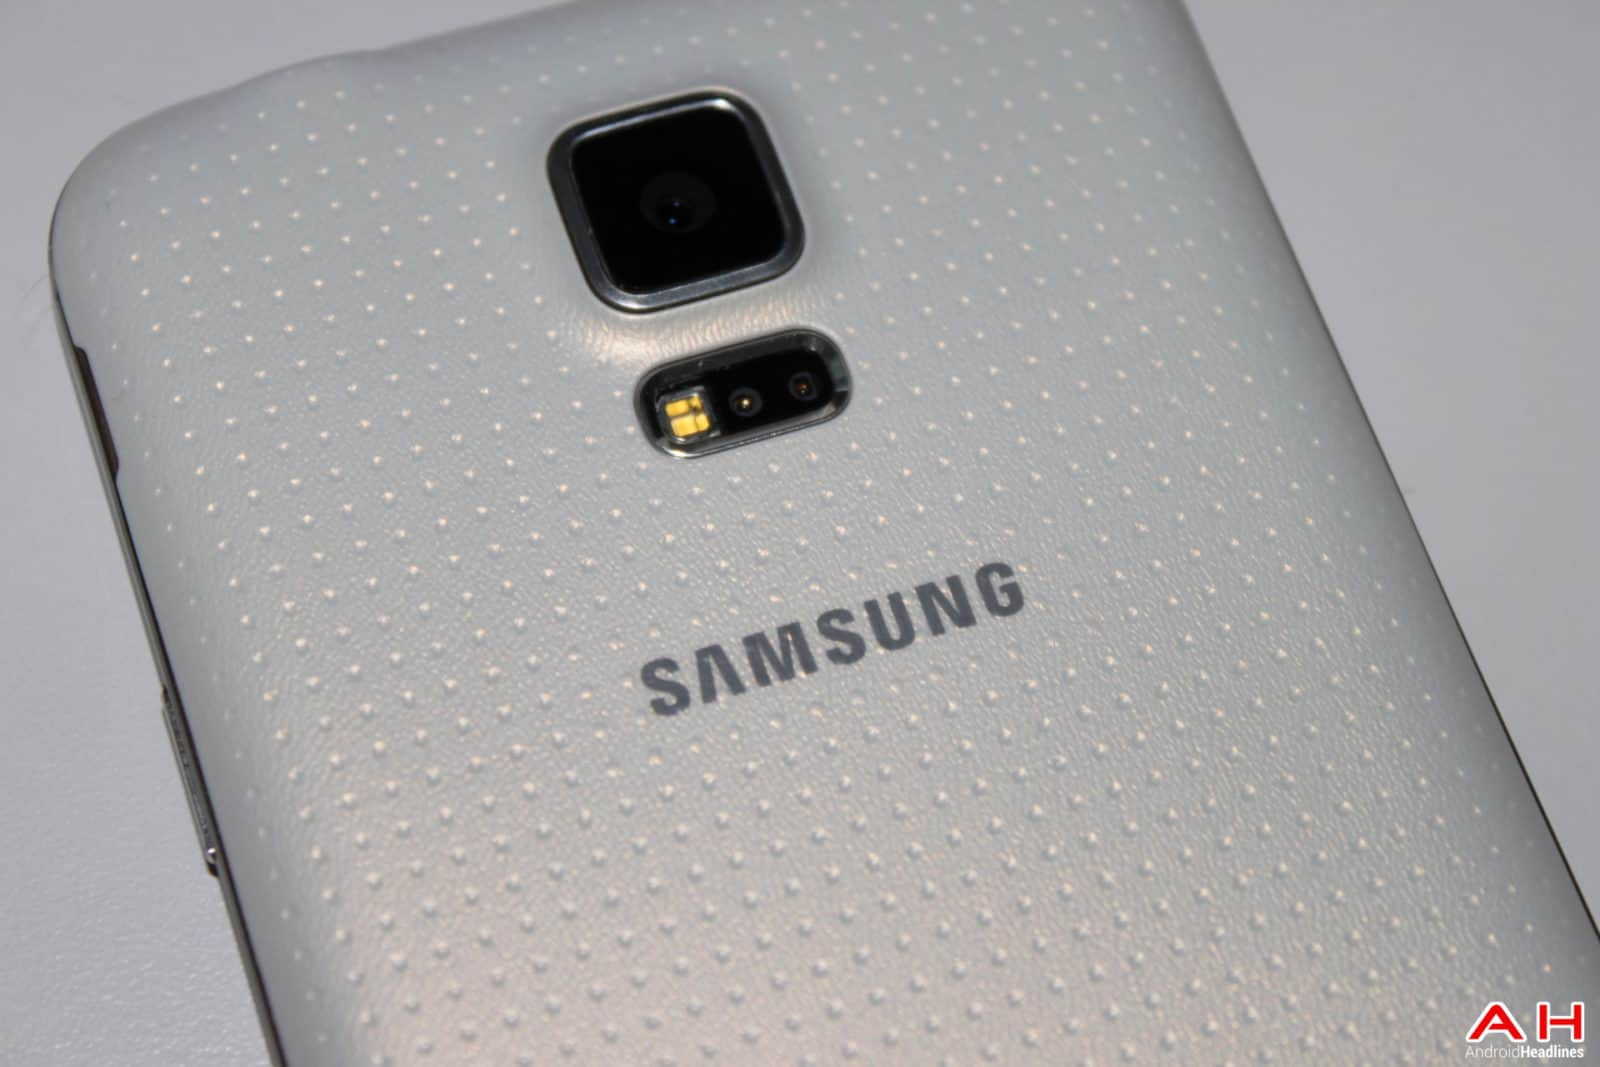 AH Samsung Galaxy S5 -14 LOGO